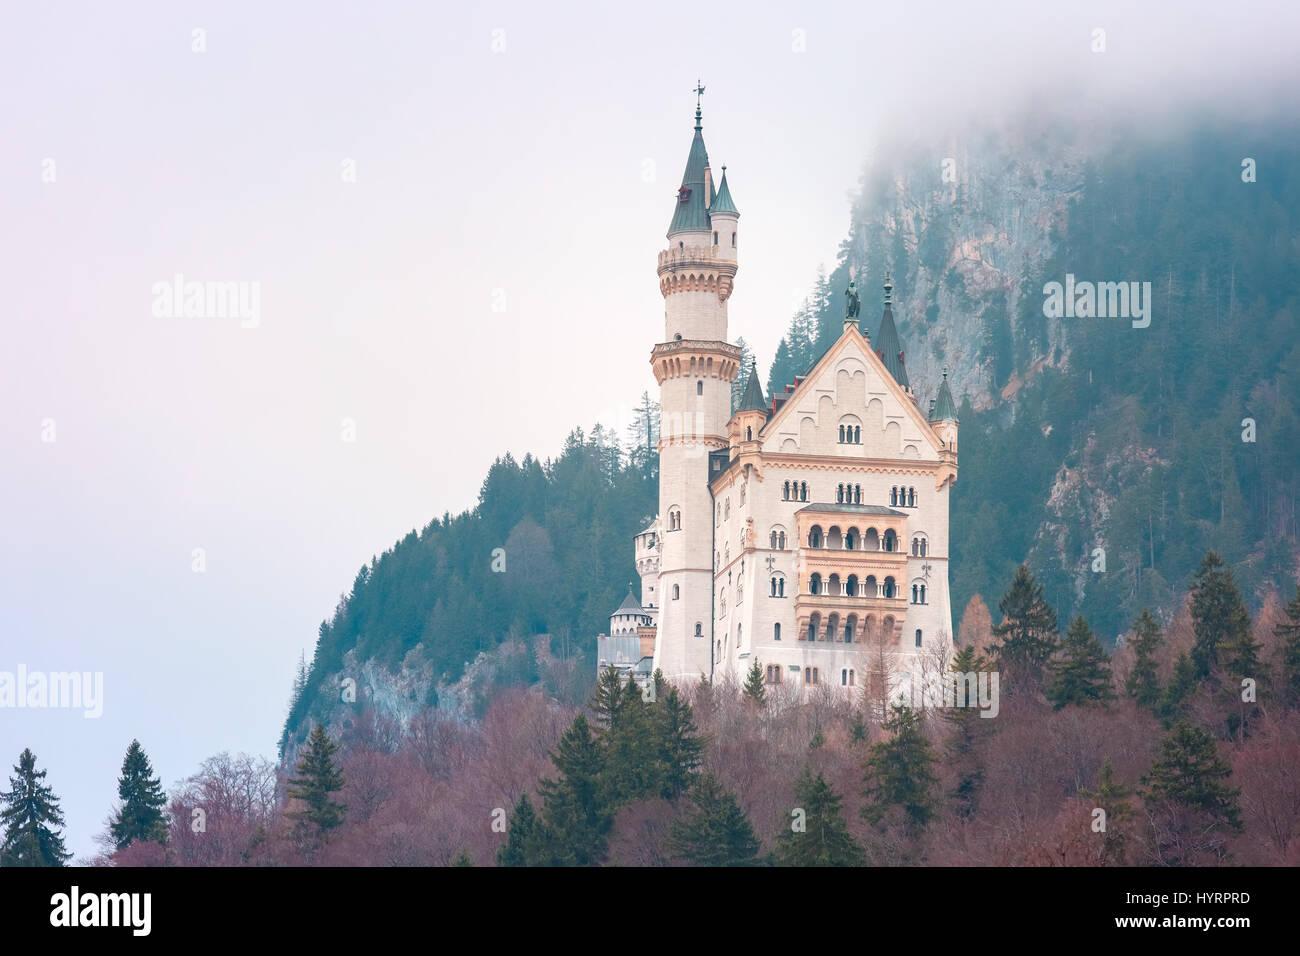 Fairytale Neuschwanstein Castle, Bavaria, Germany - Stock Image